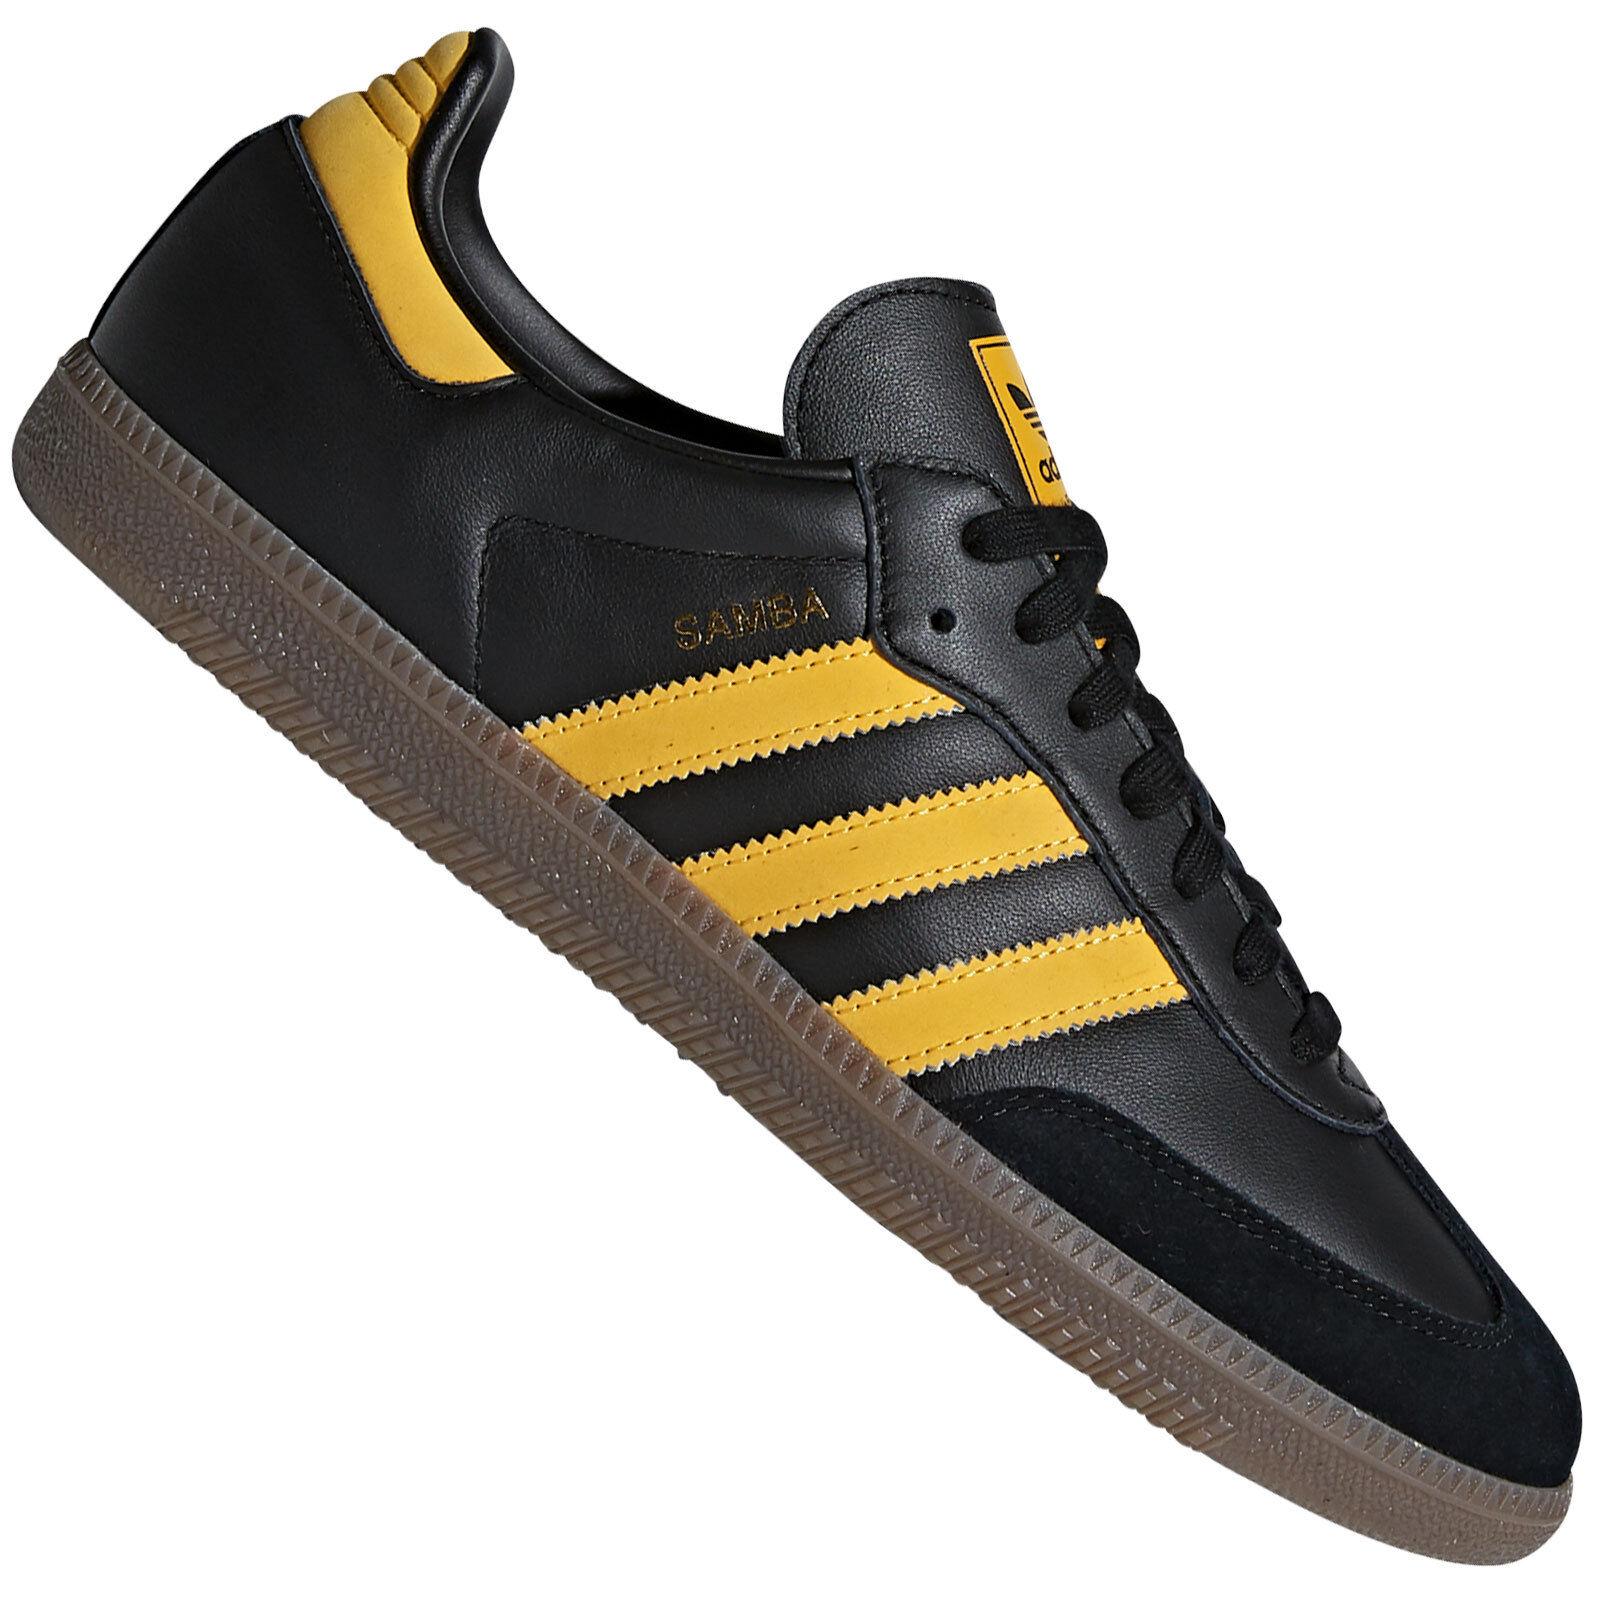 adidas Sportschuhe Originals Samba Herren-Sneaker Turnschuhe Sportschuhe adidas Lederschuhe Schuhe b5252d